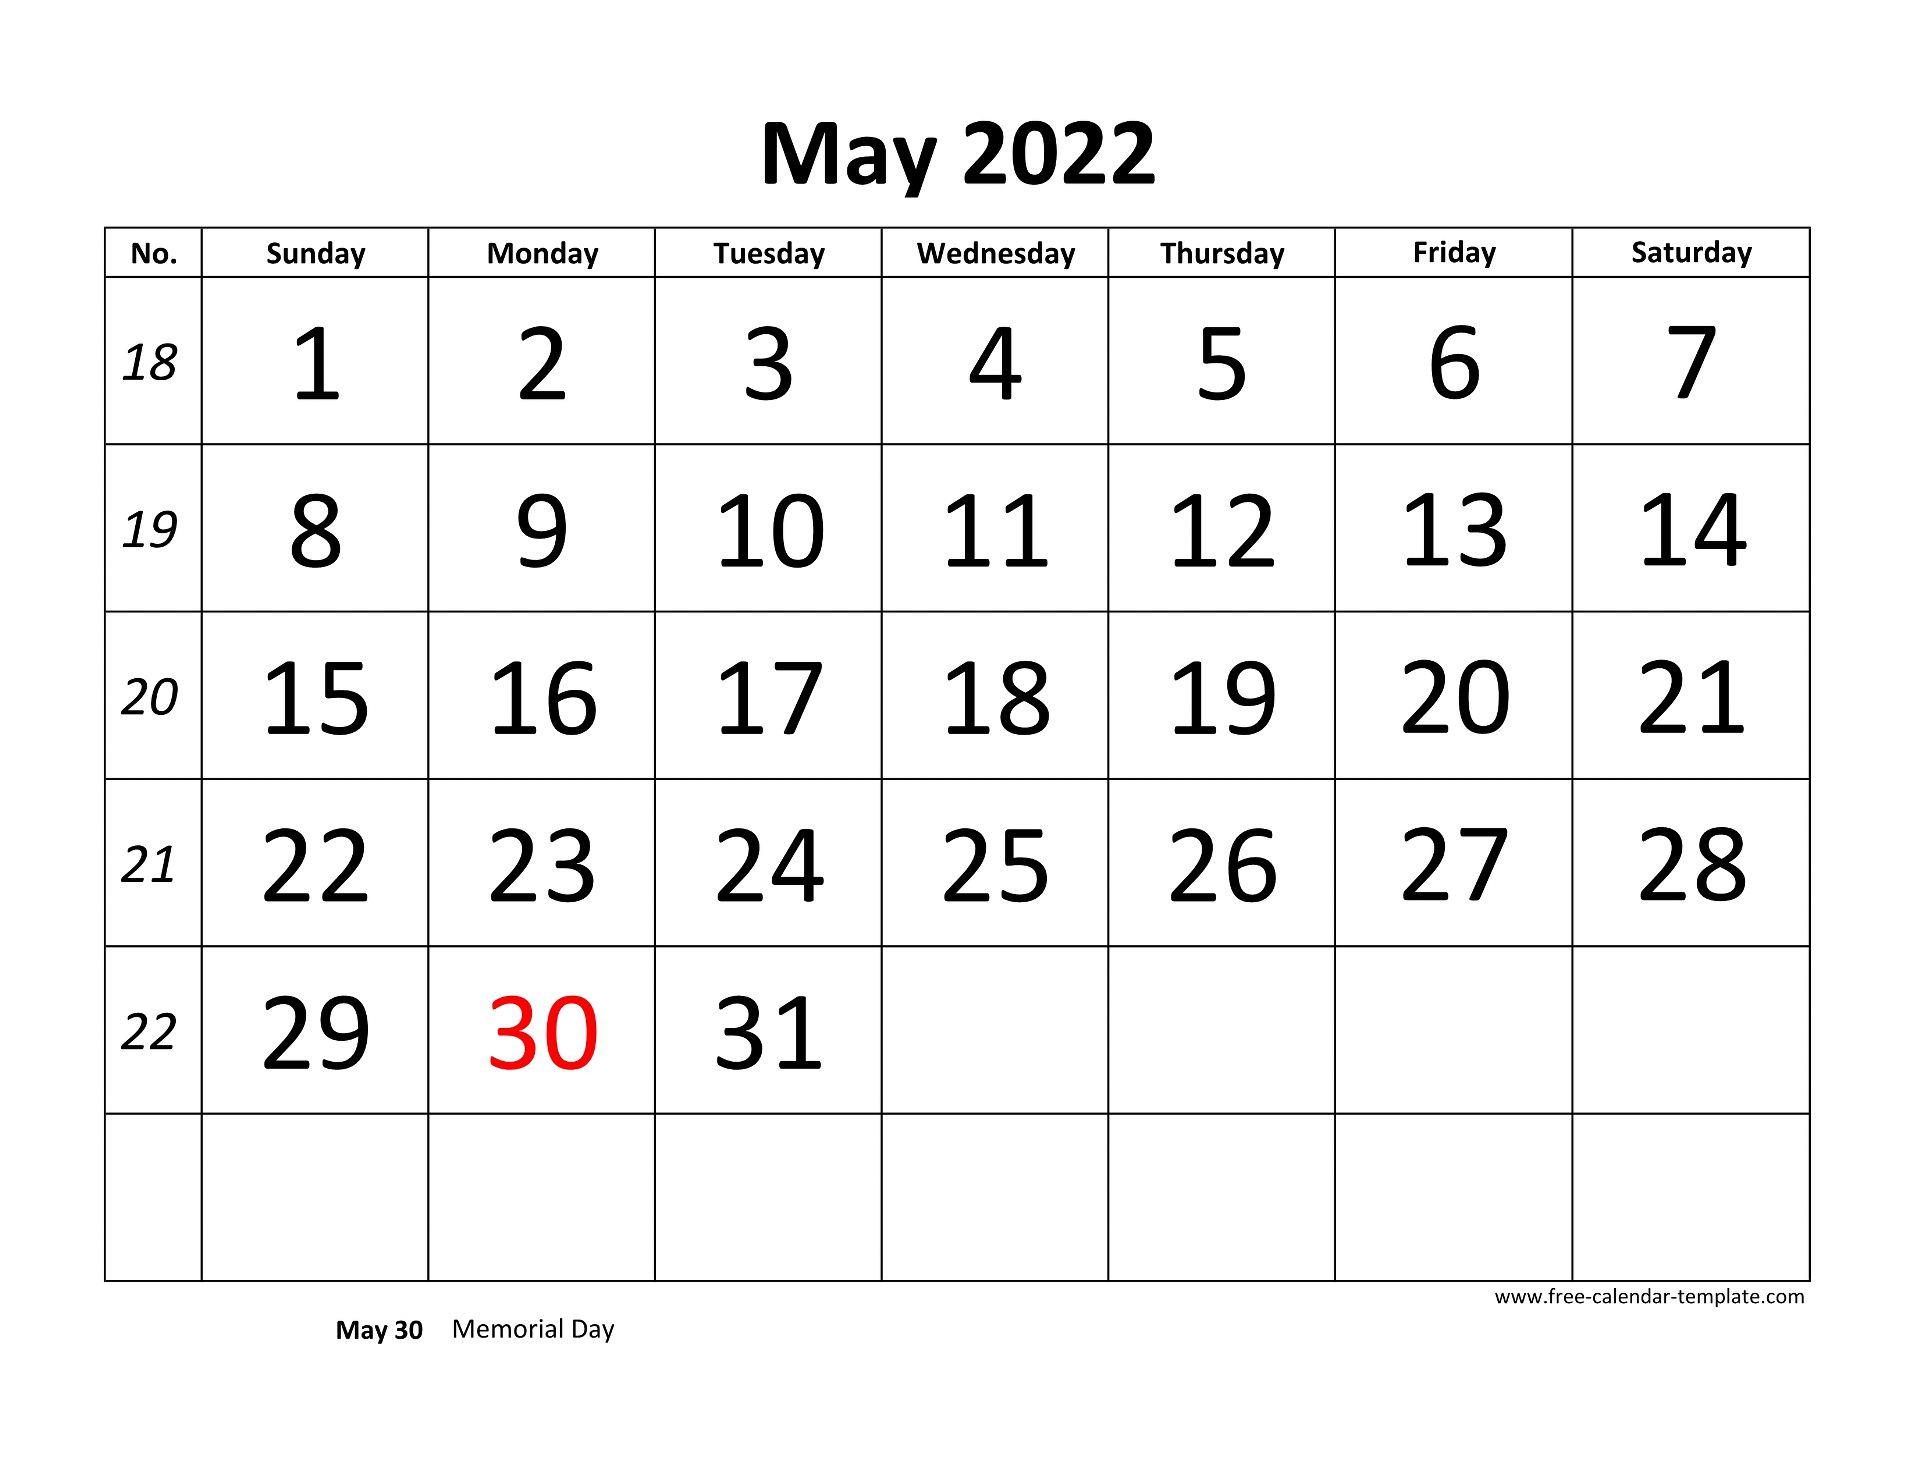 May 2022 Free Calendar Tempplate | Free-calendar-template.com